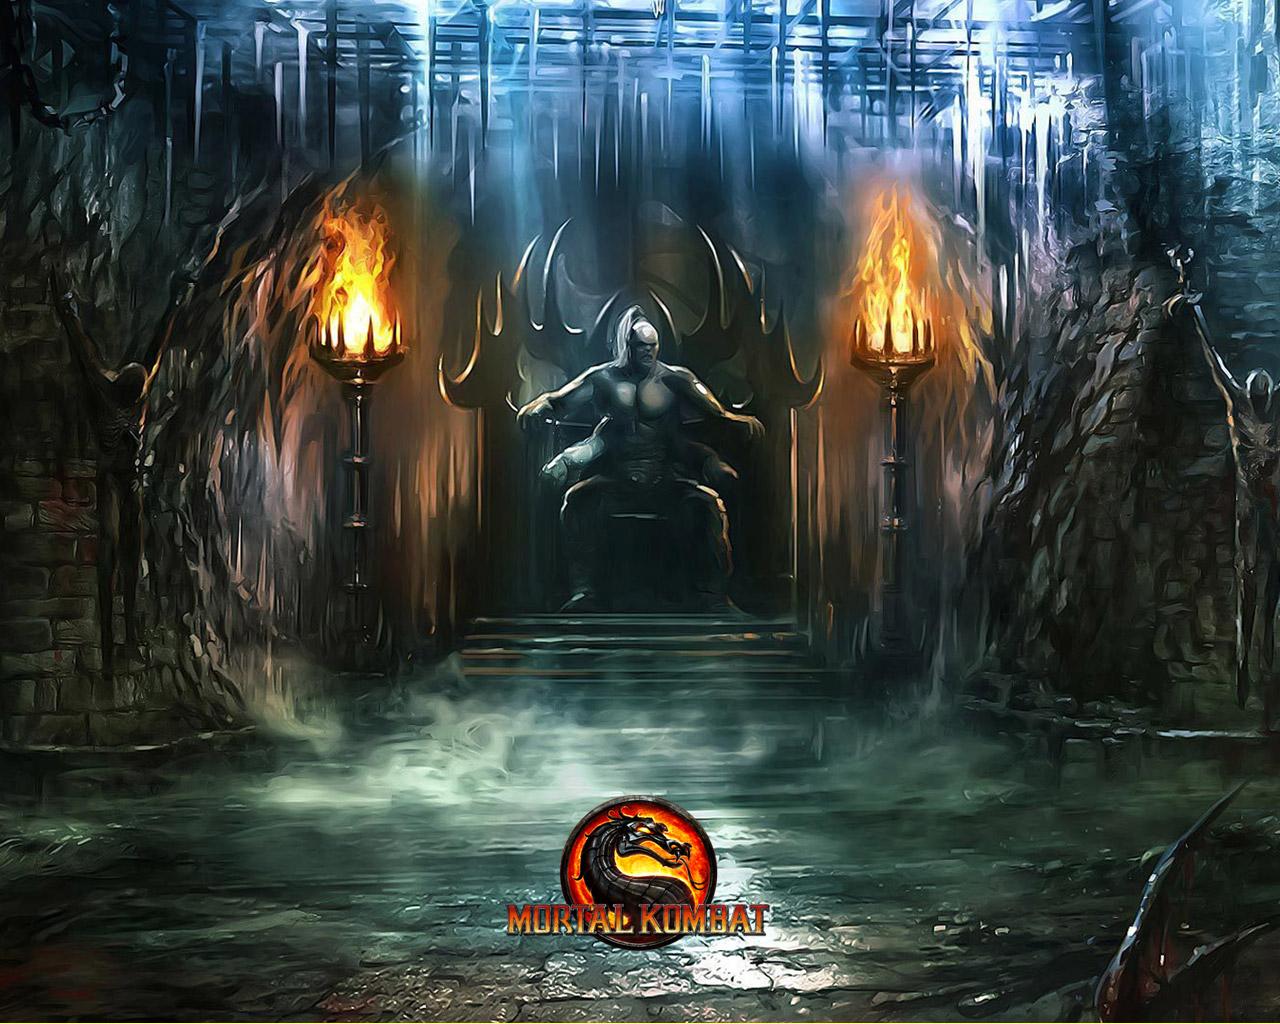 Mortal Kombat Wallpaper in 1280x1024